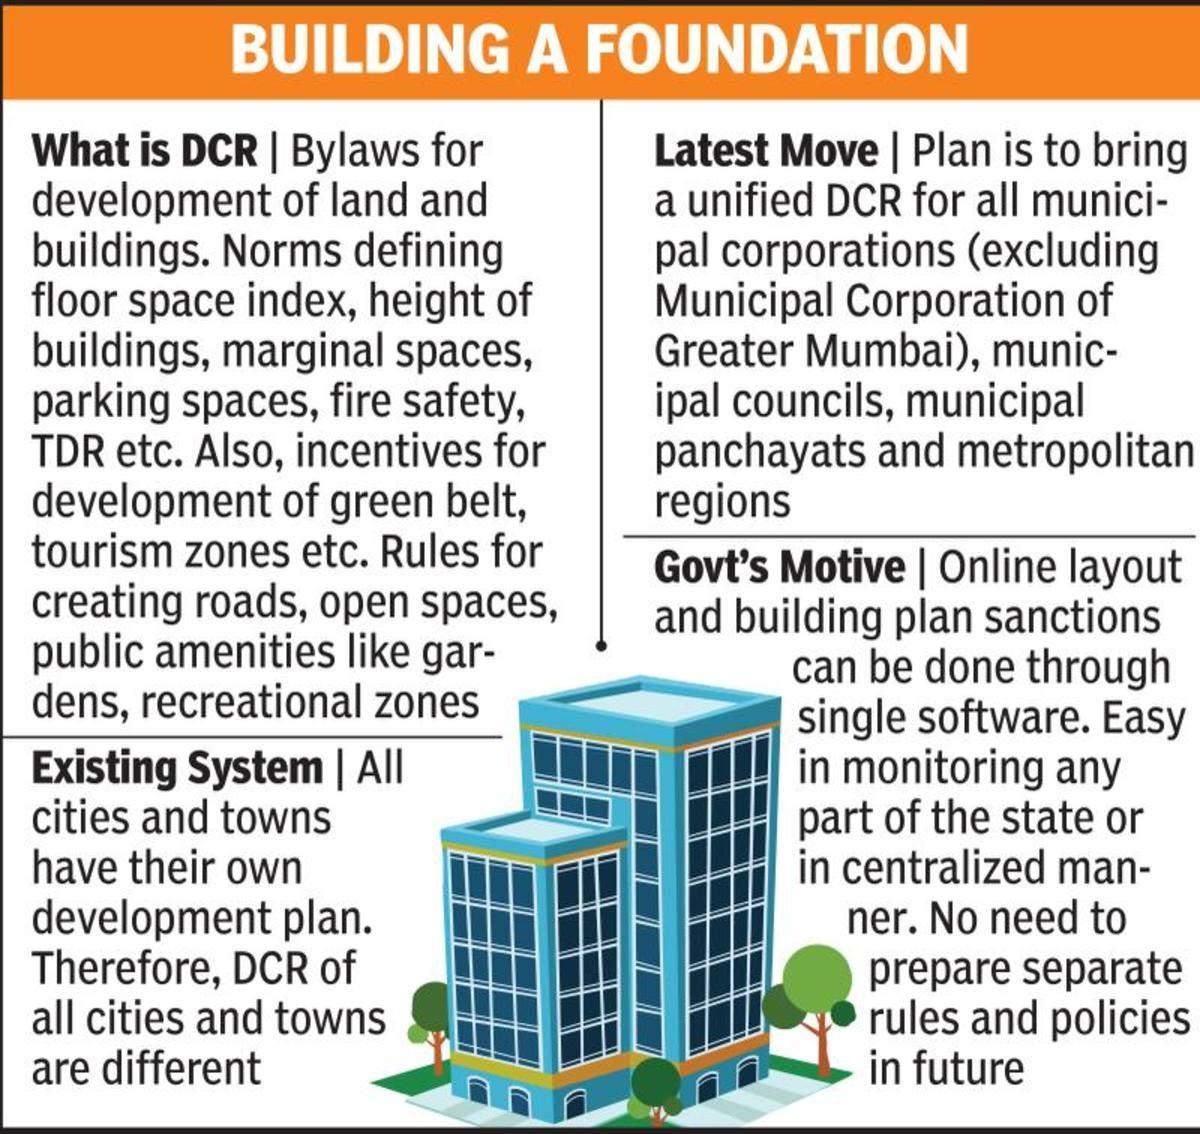 Govt plans single land bldg devpt rules for cities metro regions